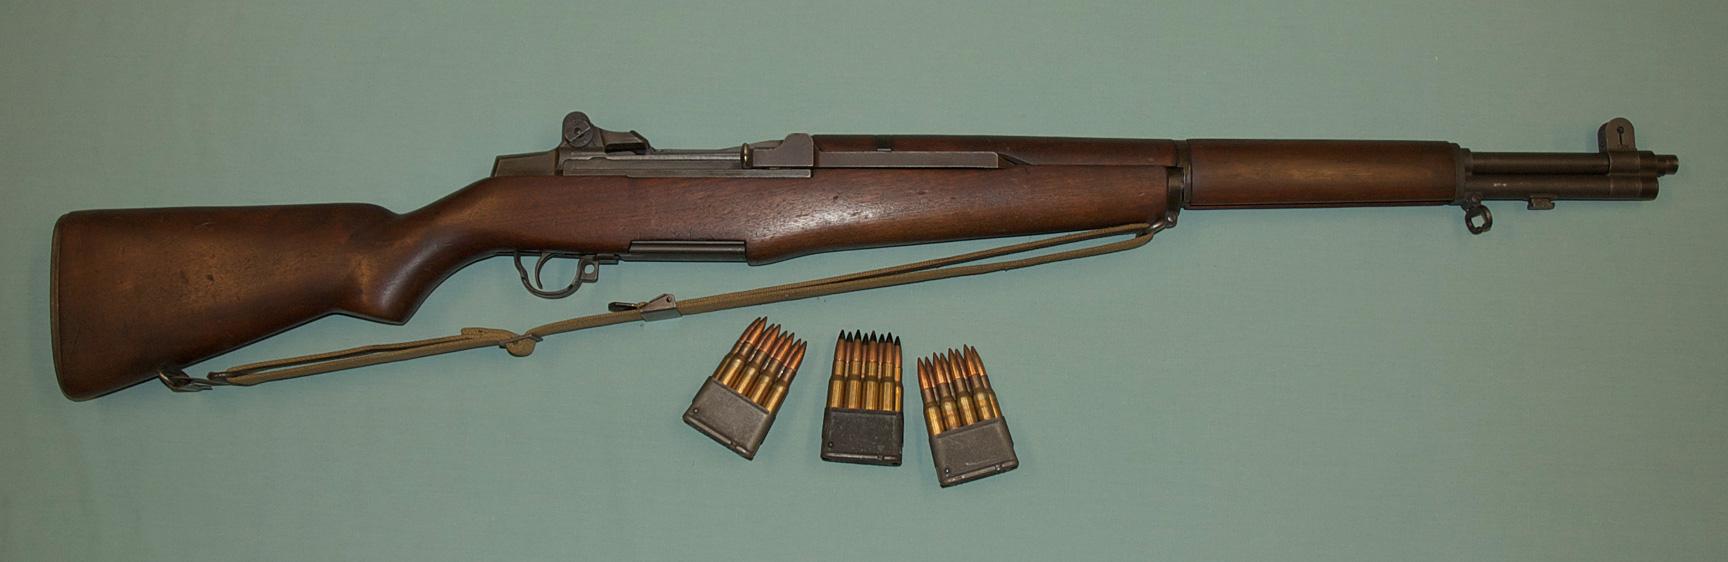 M1 Garand - Roblox Apocalypse Rising Wiki